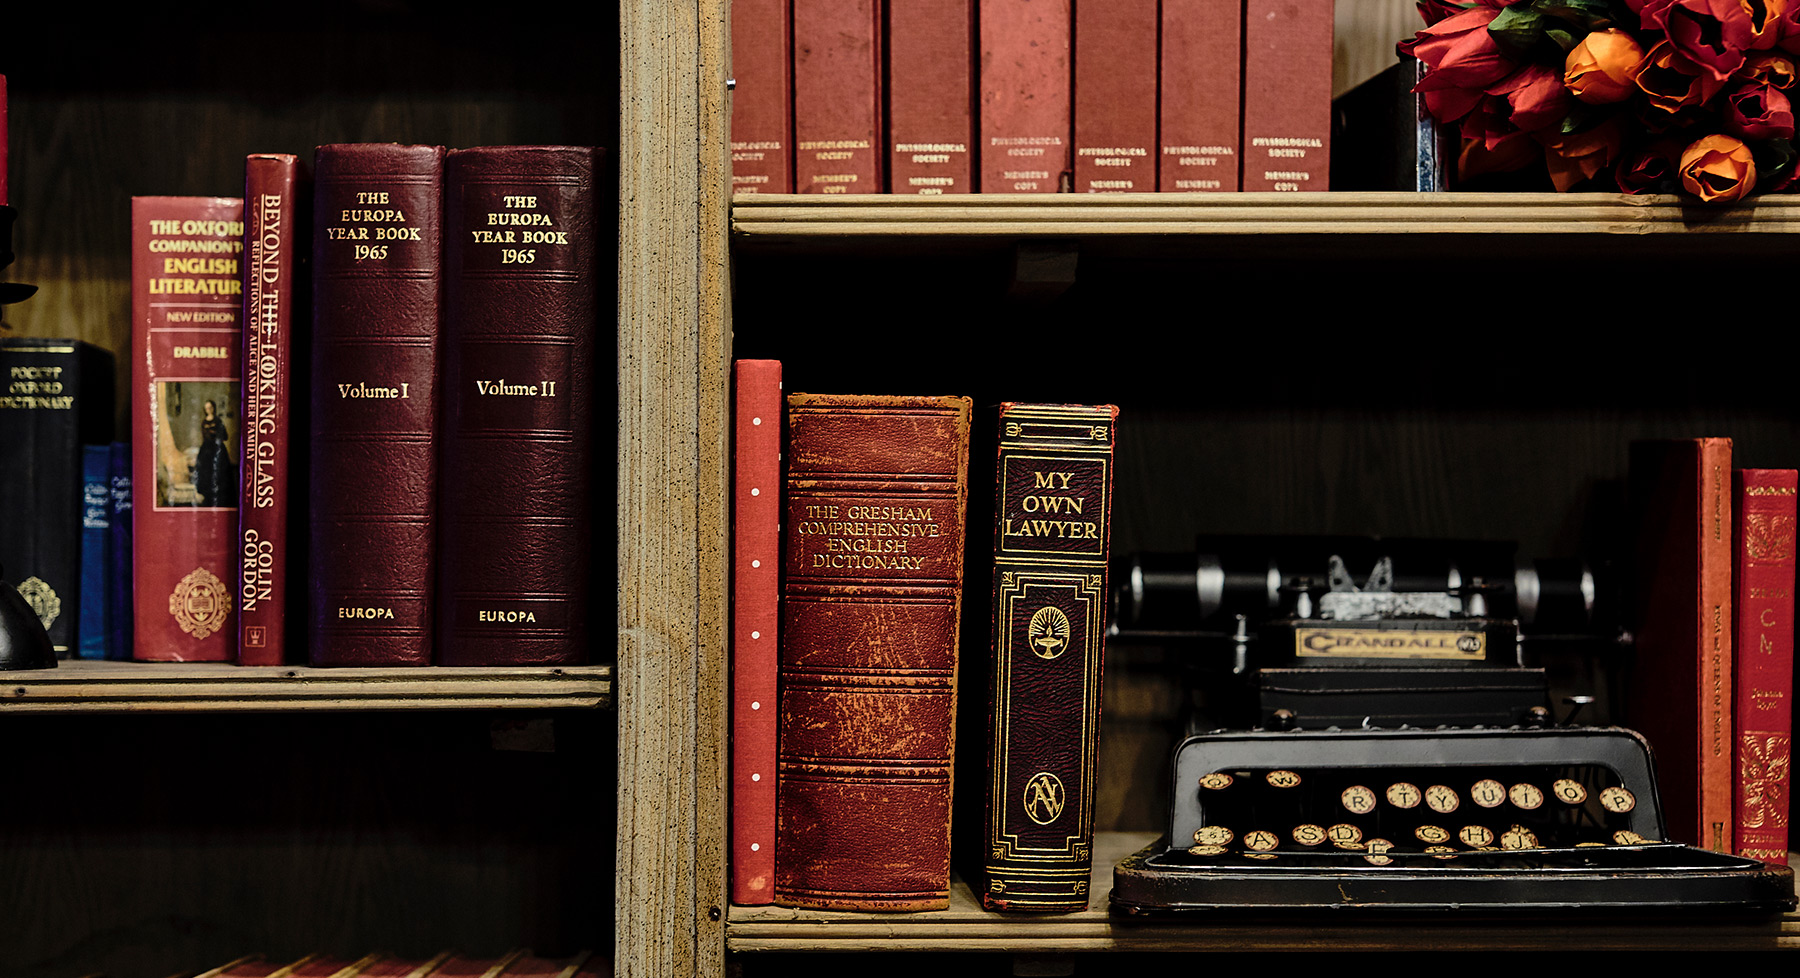 Bookshelves with typewriter